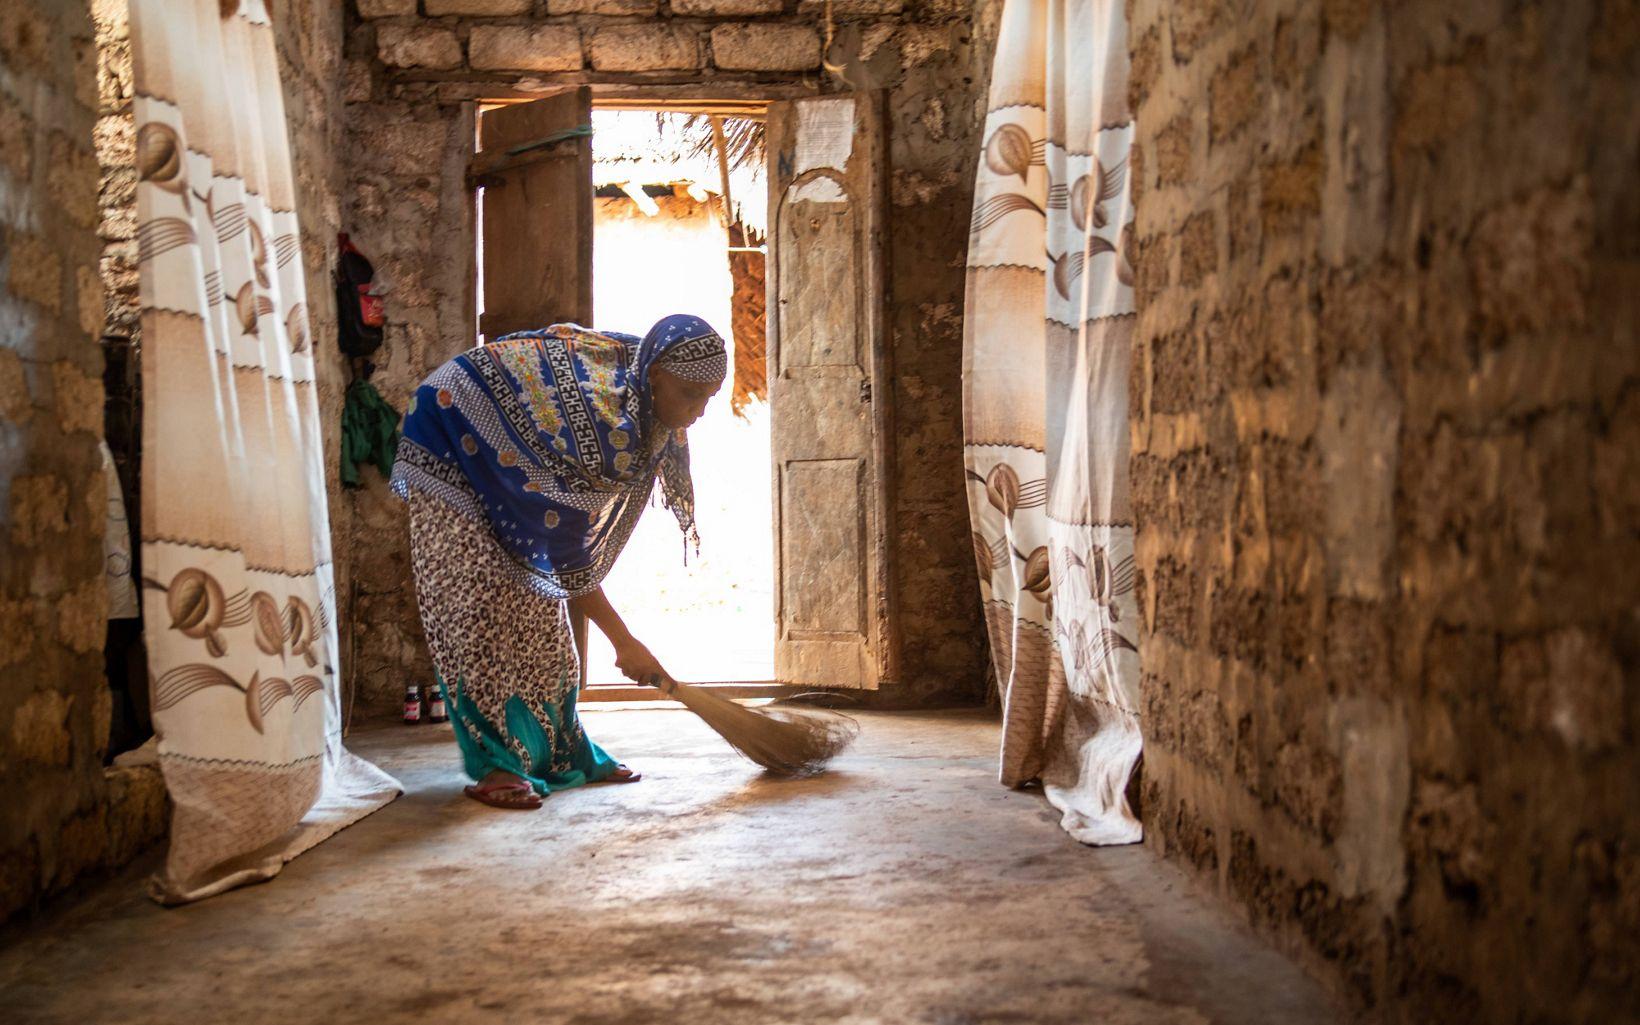 woman sweeping a floor